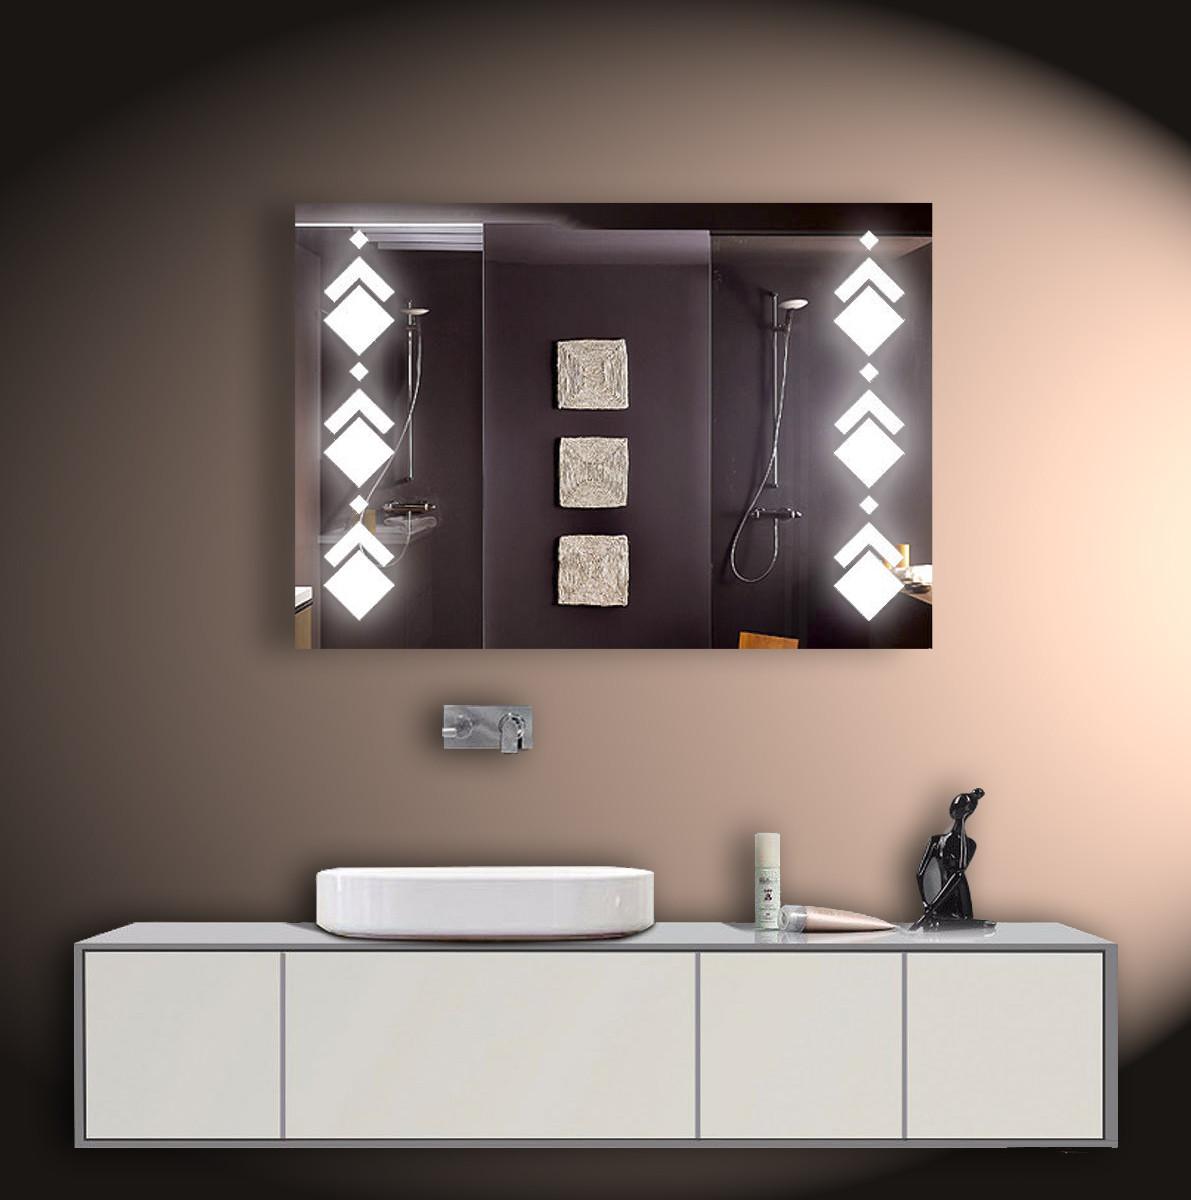 Зеркало LED со светодиодной подсветкой ver-3082 1000х700 мм